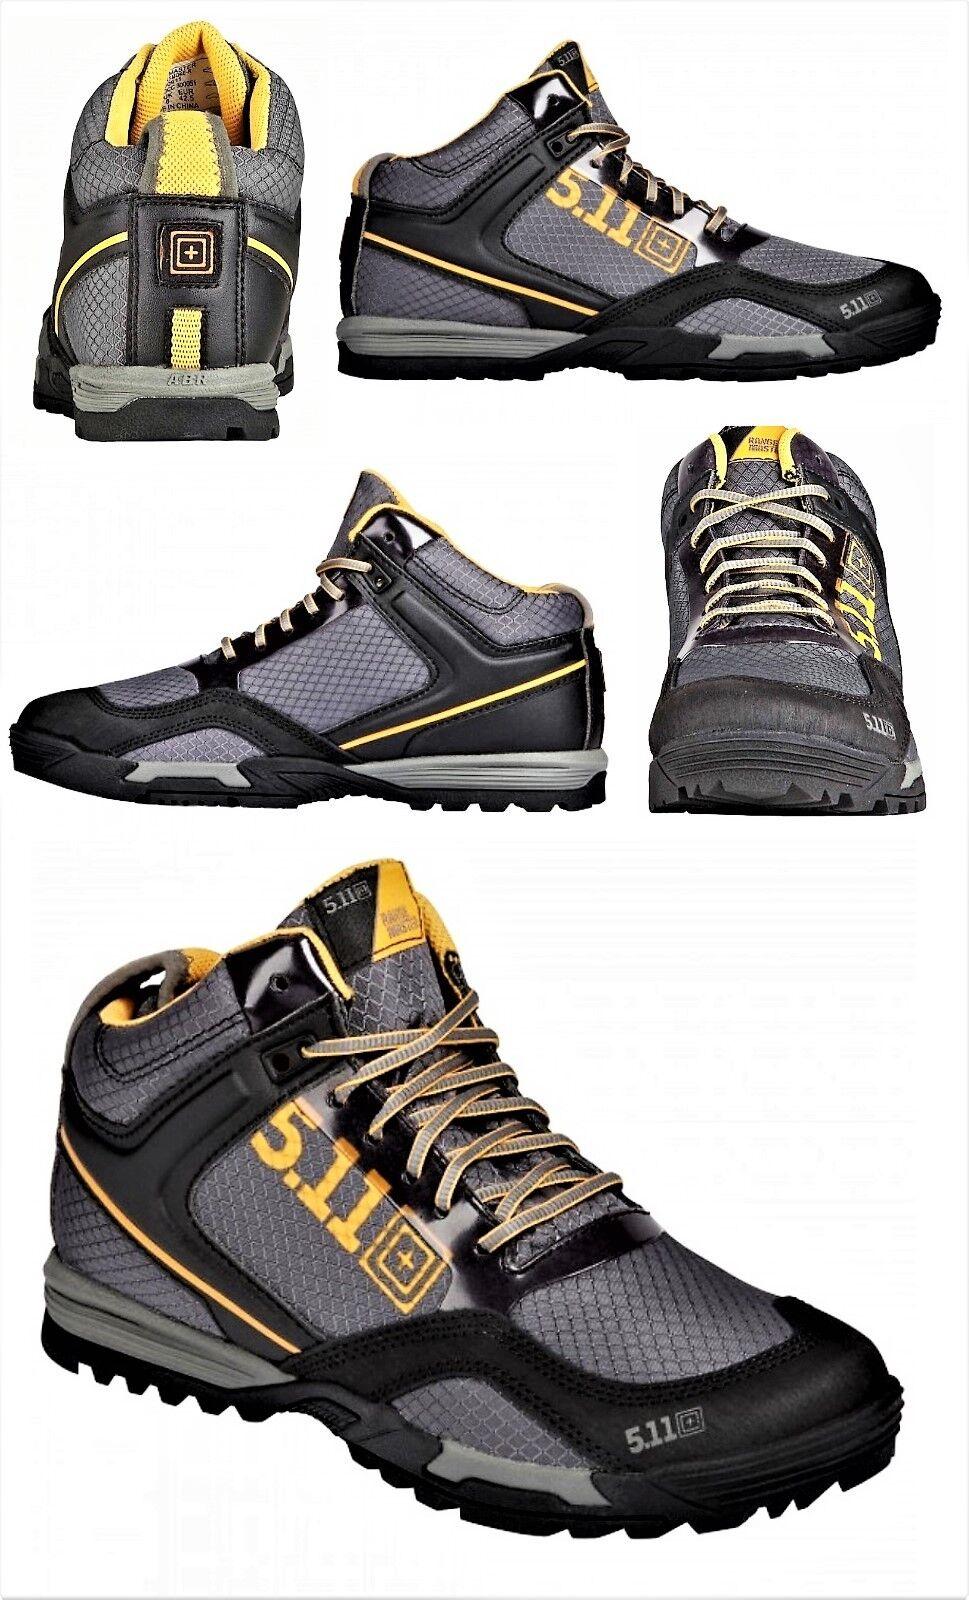 5.11 Tactical Range Master Boot - Color: Dark Coyote or Gunsmoke, New in Box